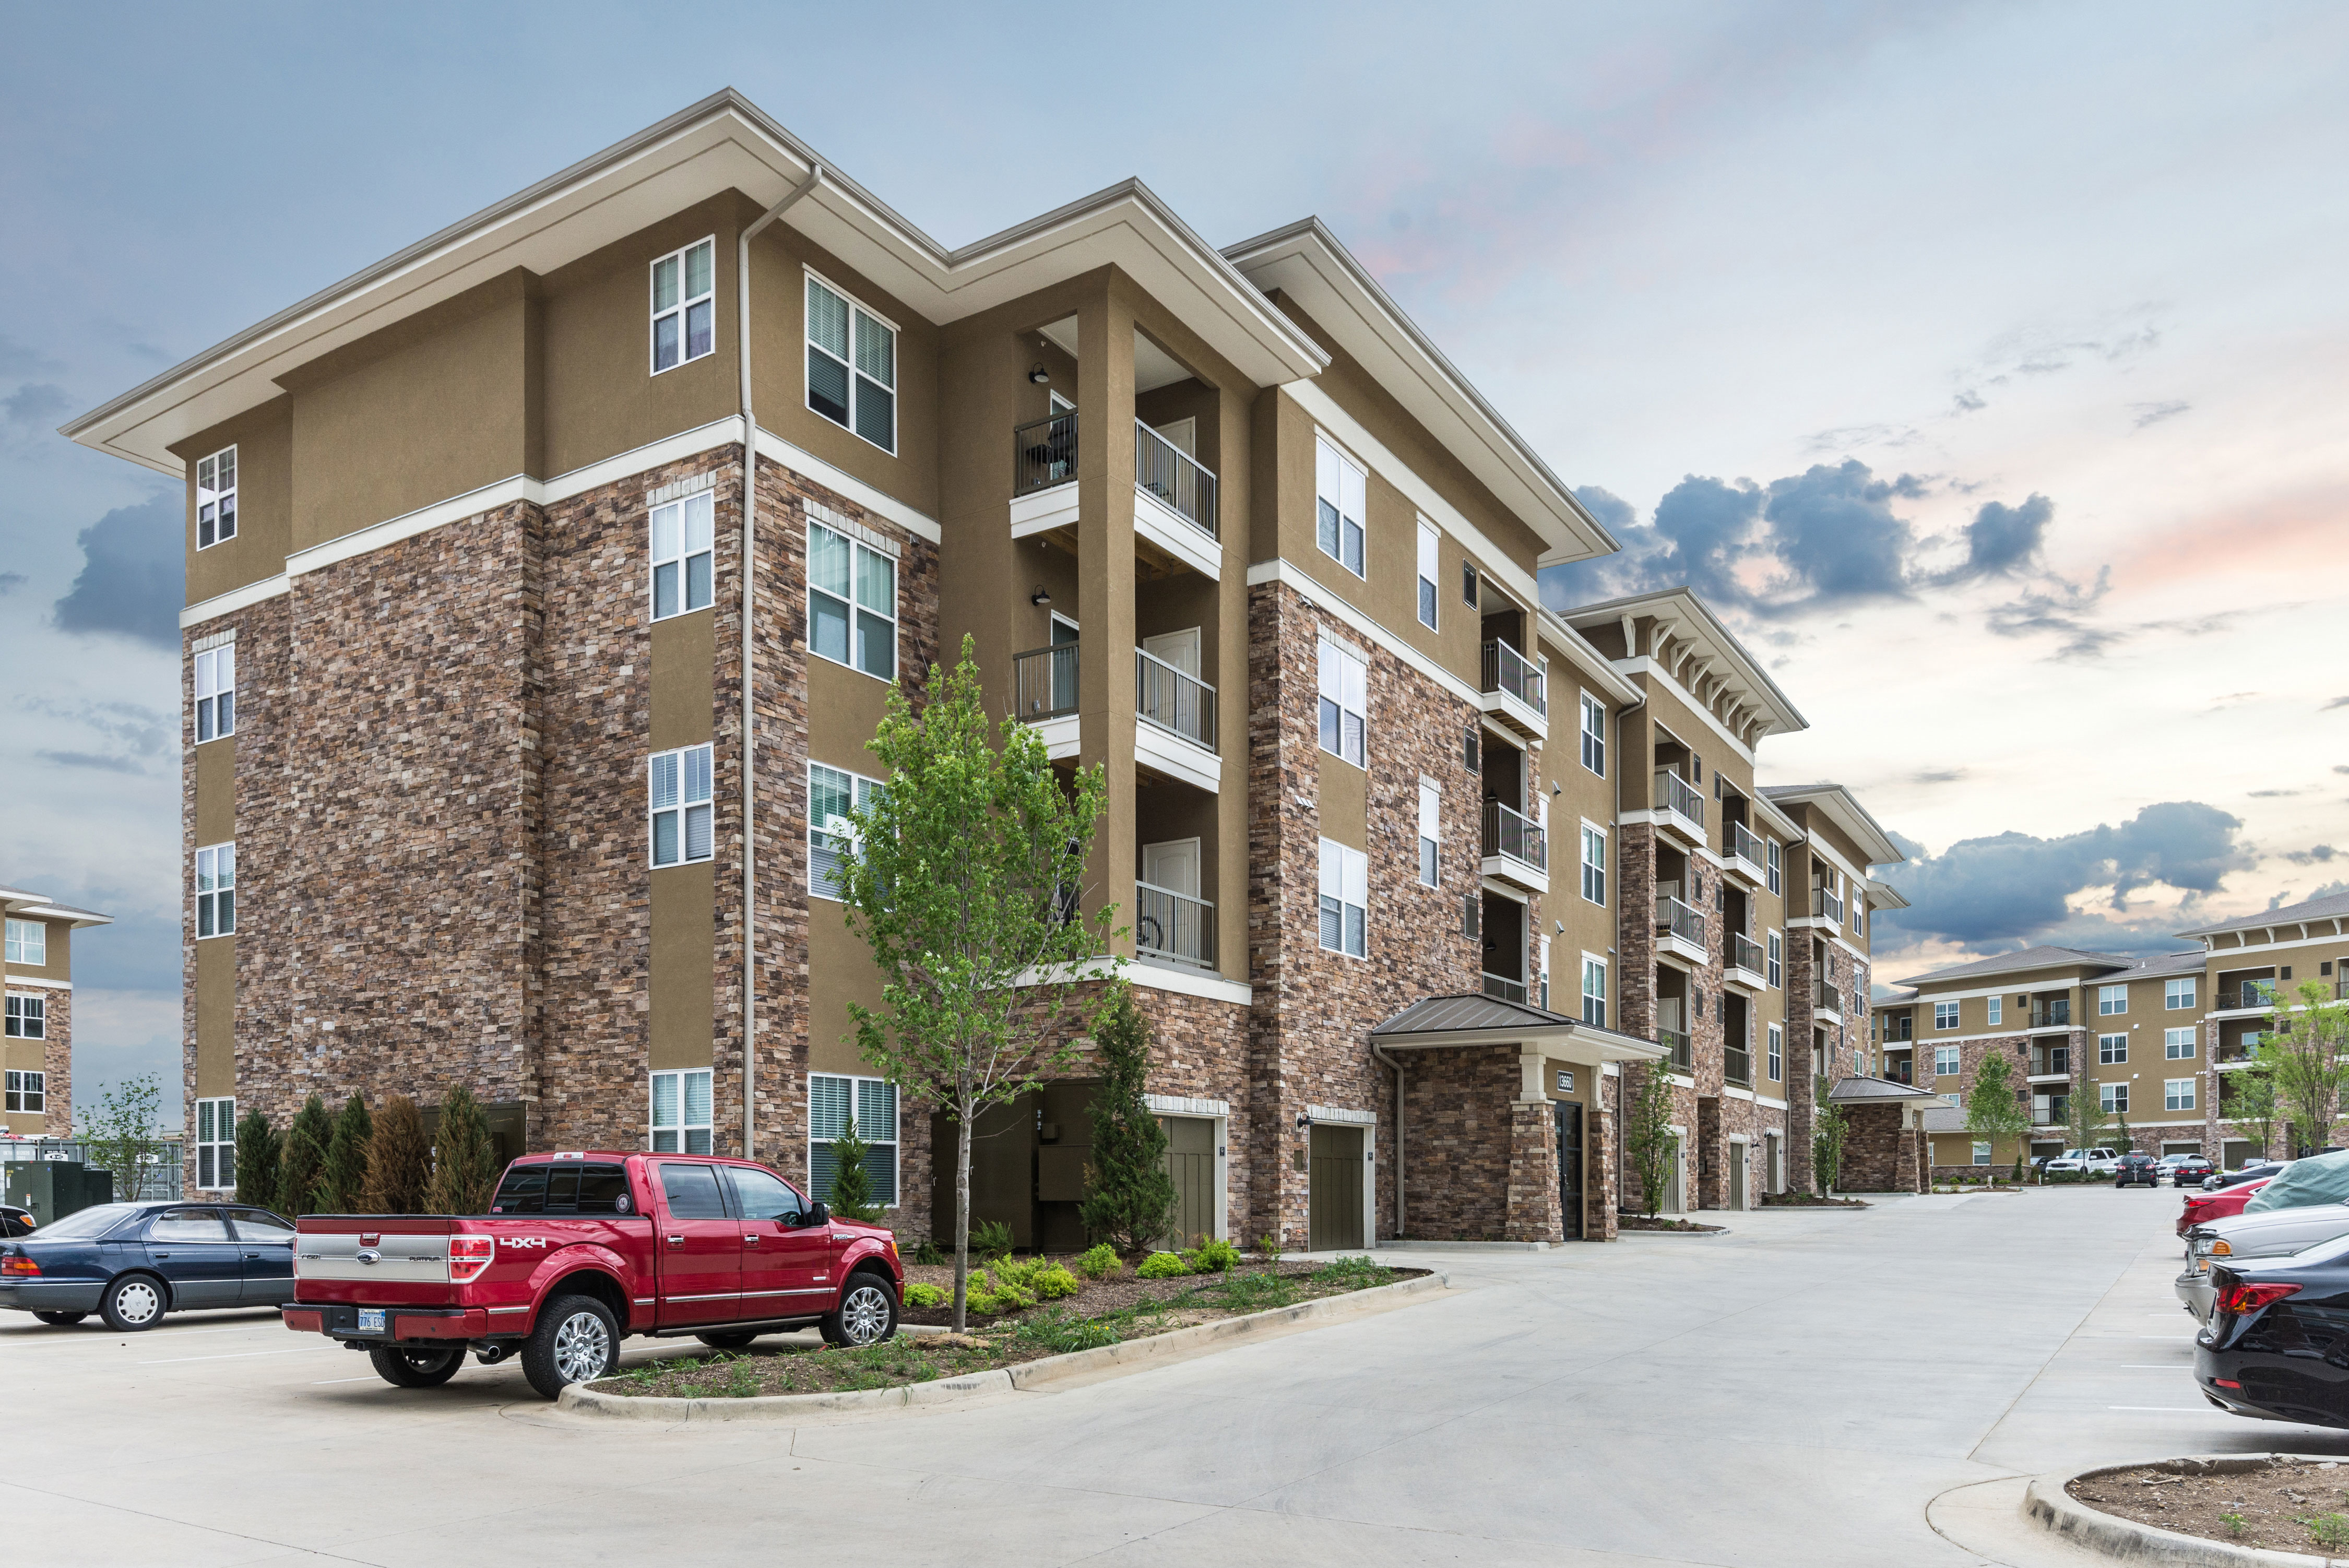 Residences At Prairiefire In Overland Park Ks 66223